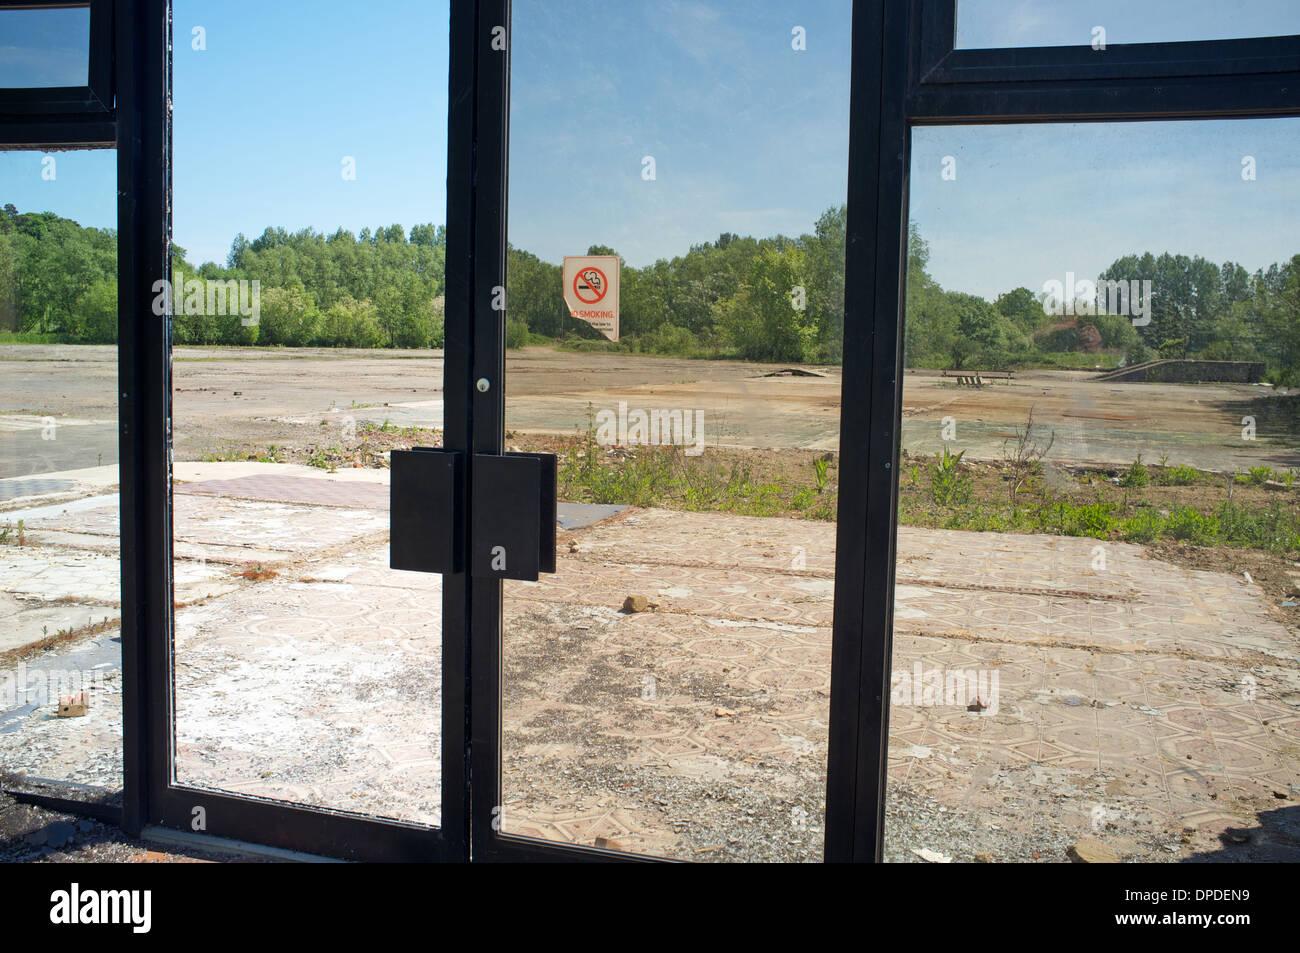 Demolished commercial building, Melton, Suffolk, UK. - Stock Image